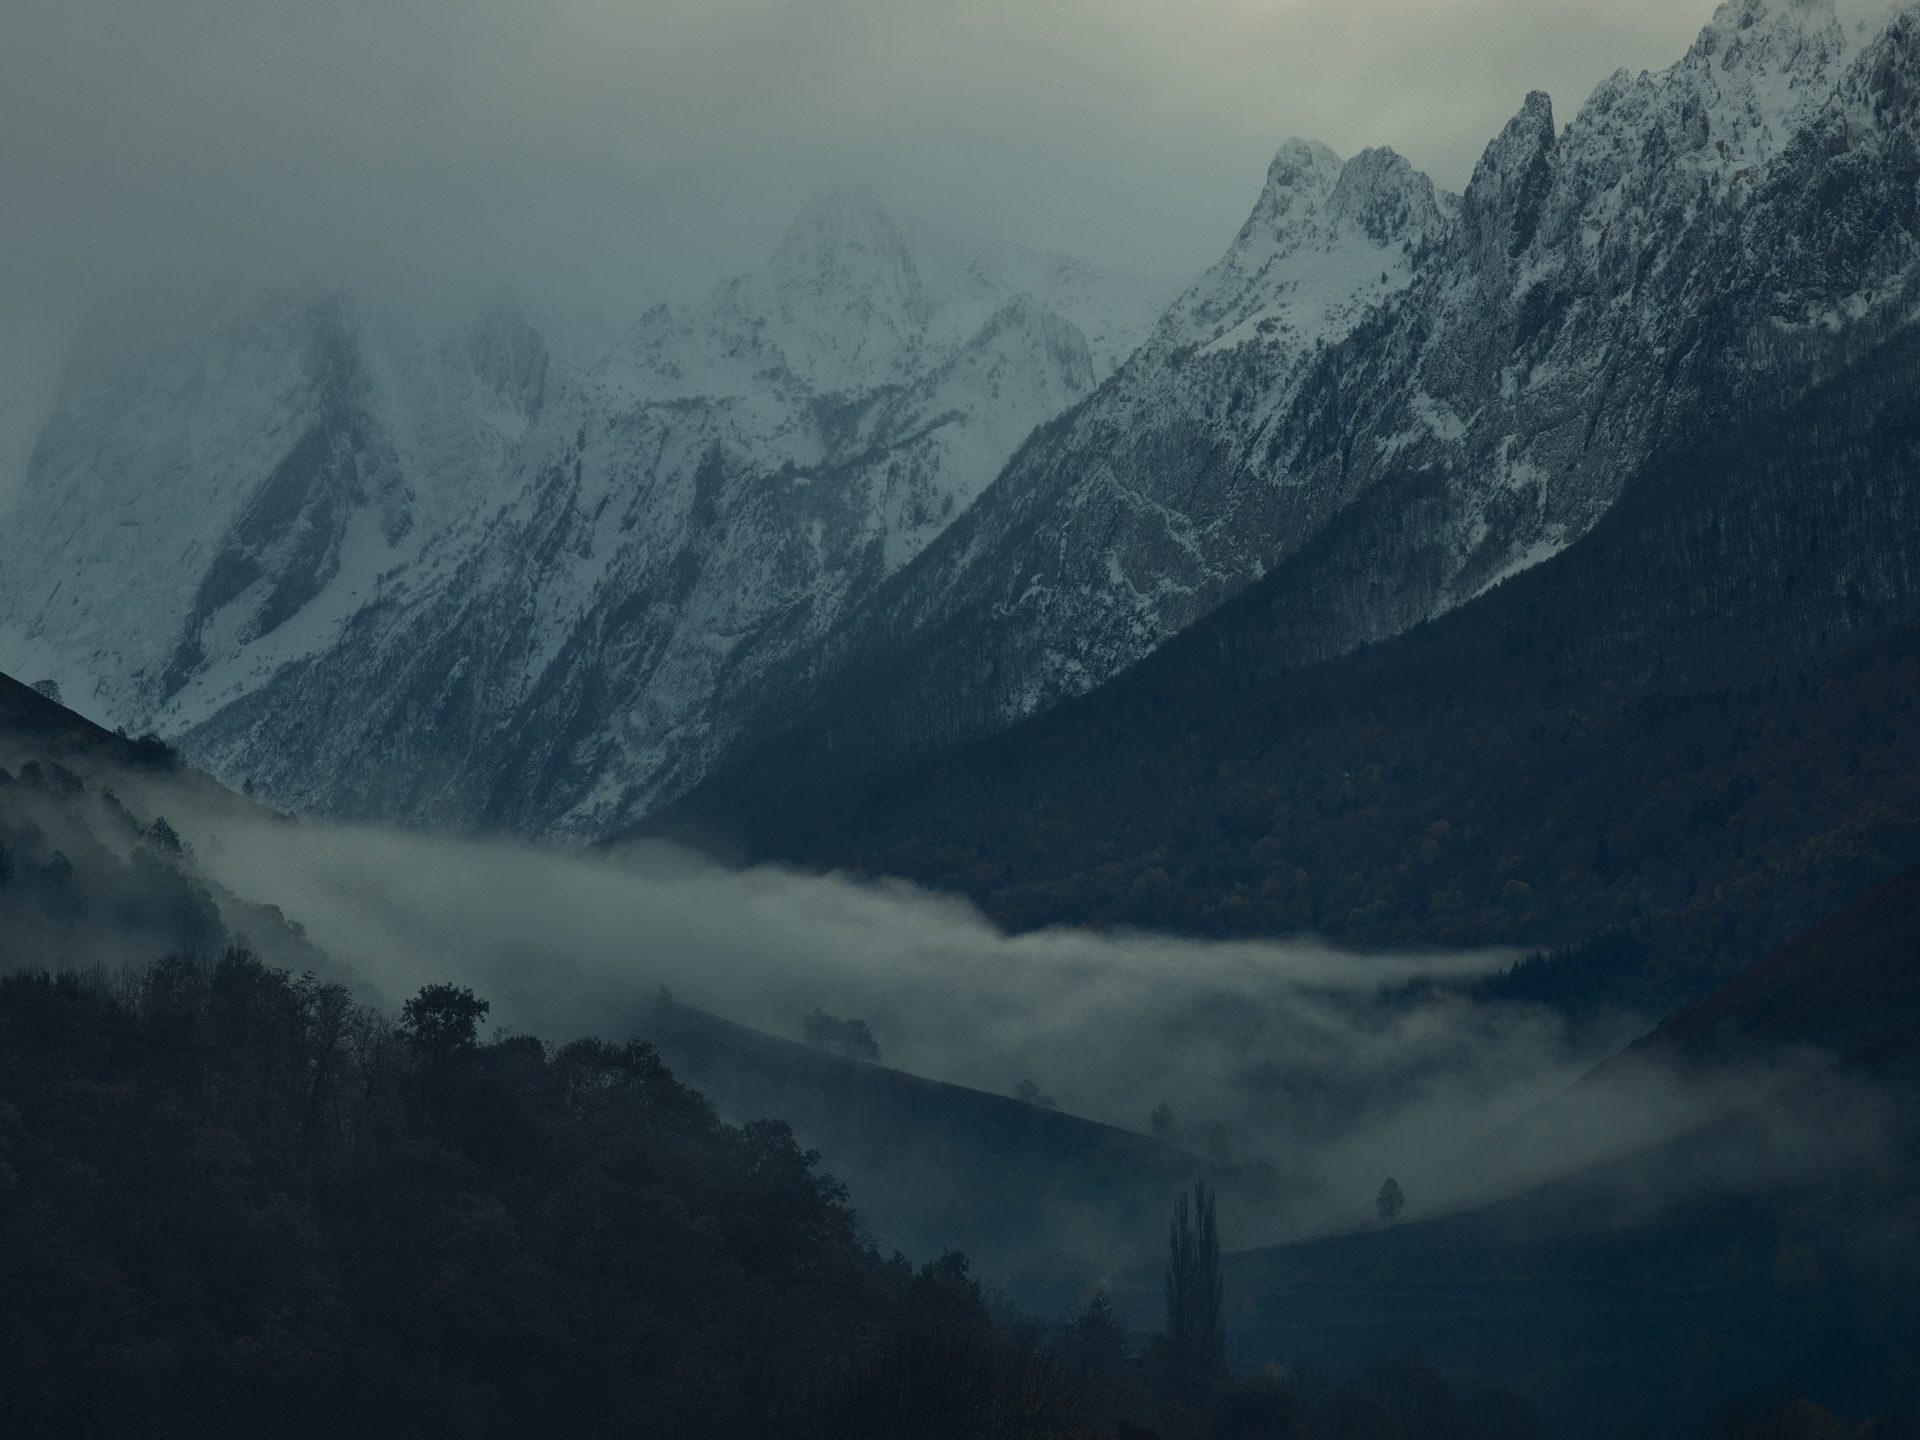 pyrenees, landscape, france, spain, anke luckmann, mountains, www.ankeluckmann.com, snow